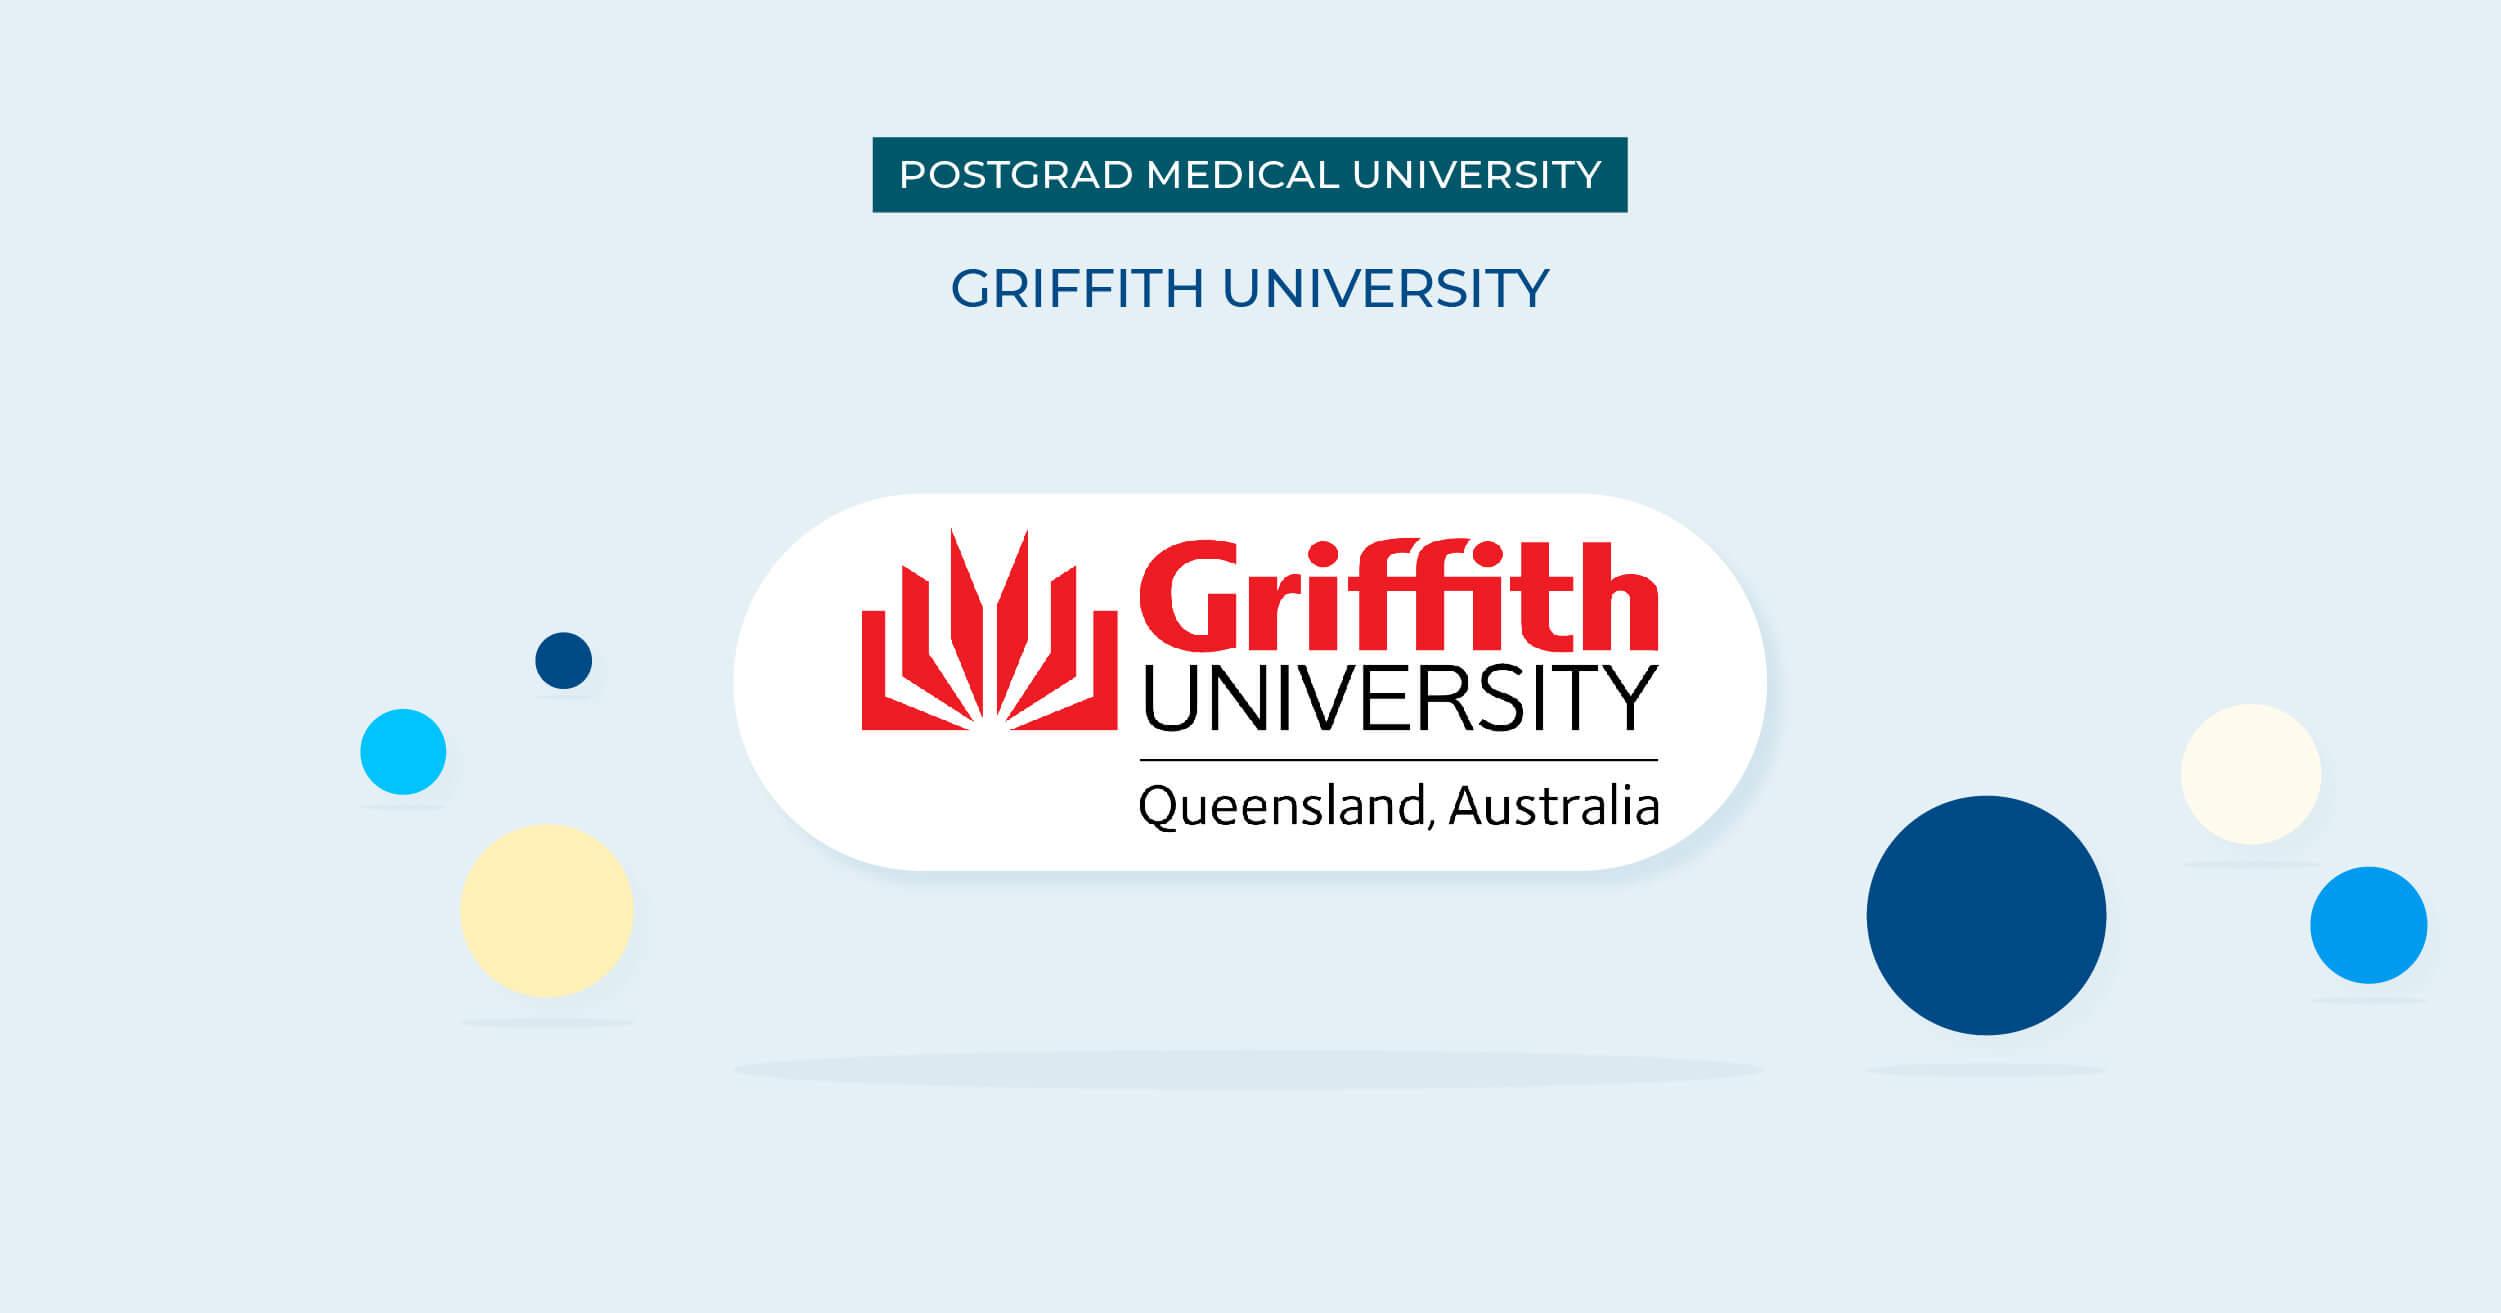 Griffith University School of Medicine